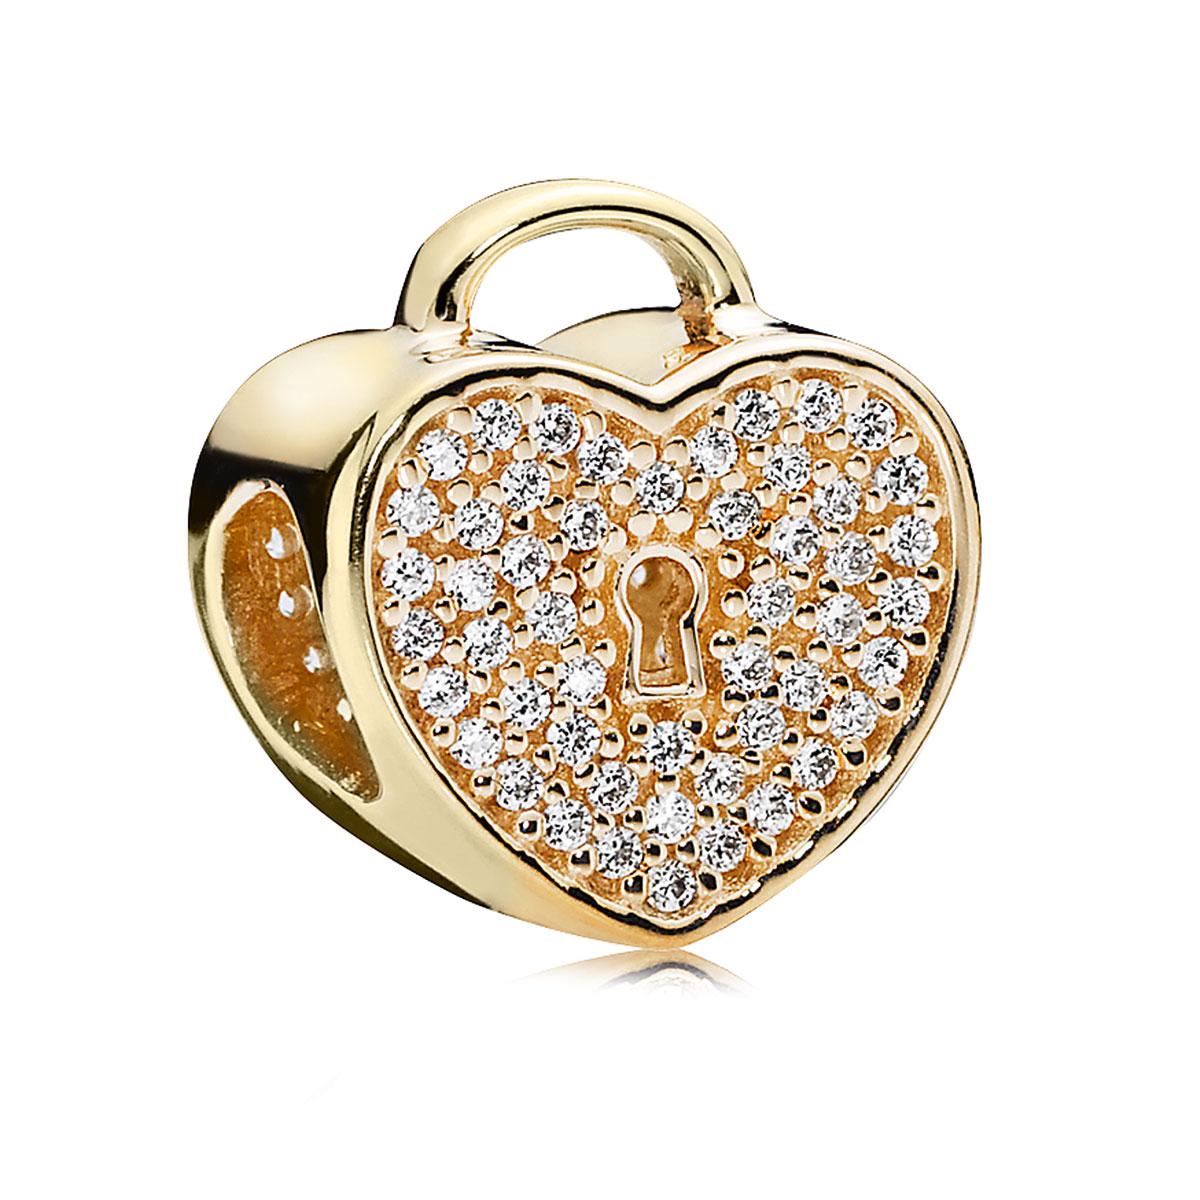 Pandora 14k Heart Lock With Clear Cz Charm